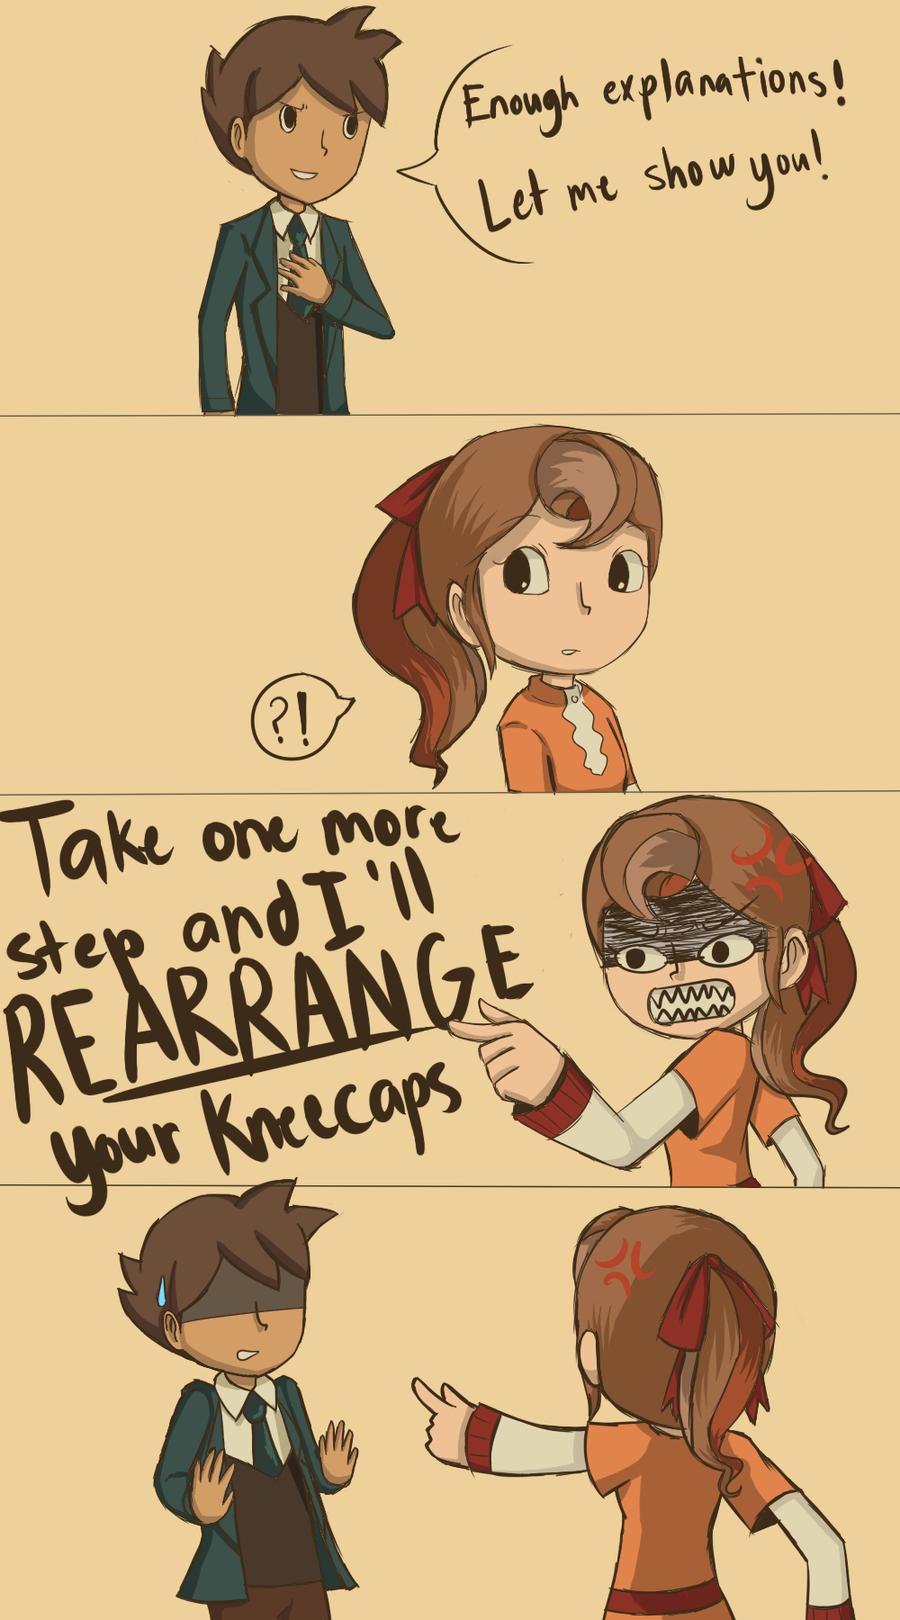 Rearranging kneecaps by KatInATopHat